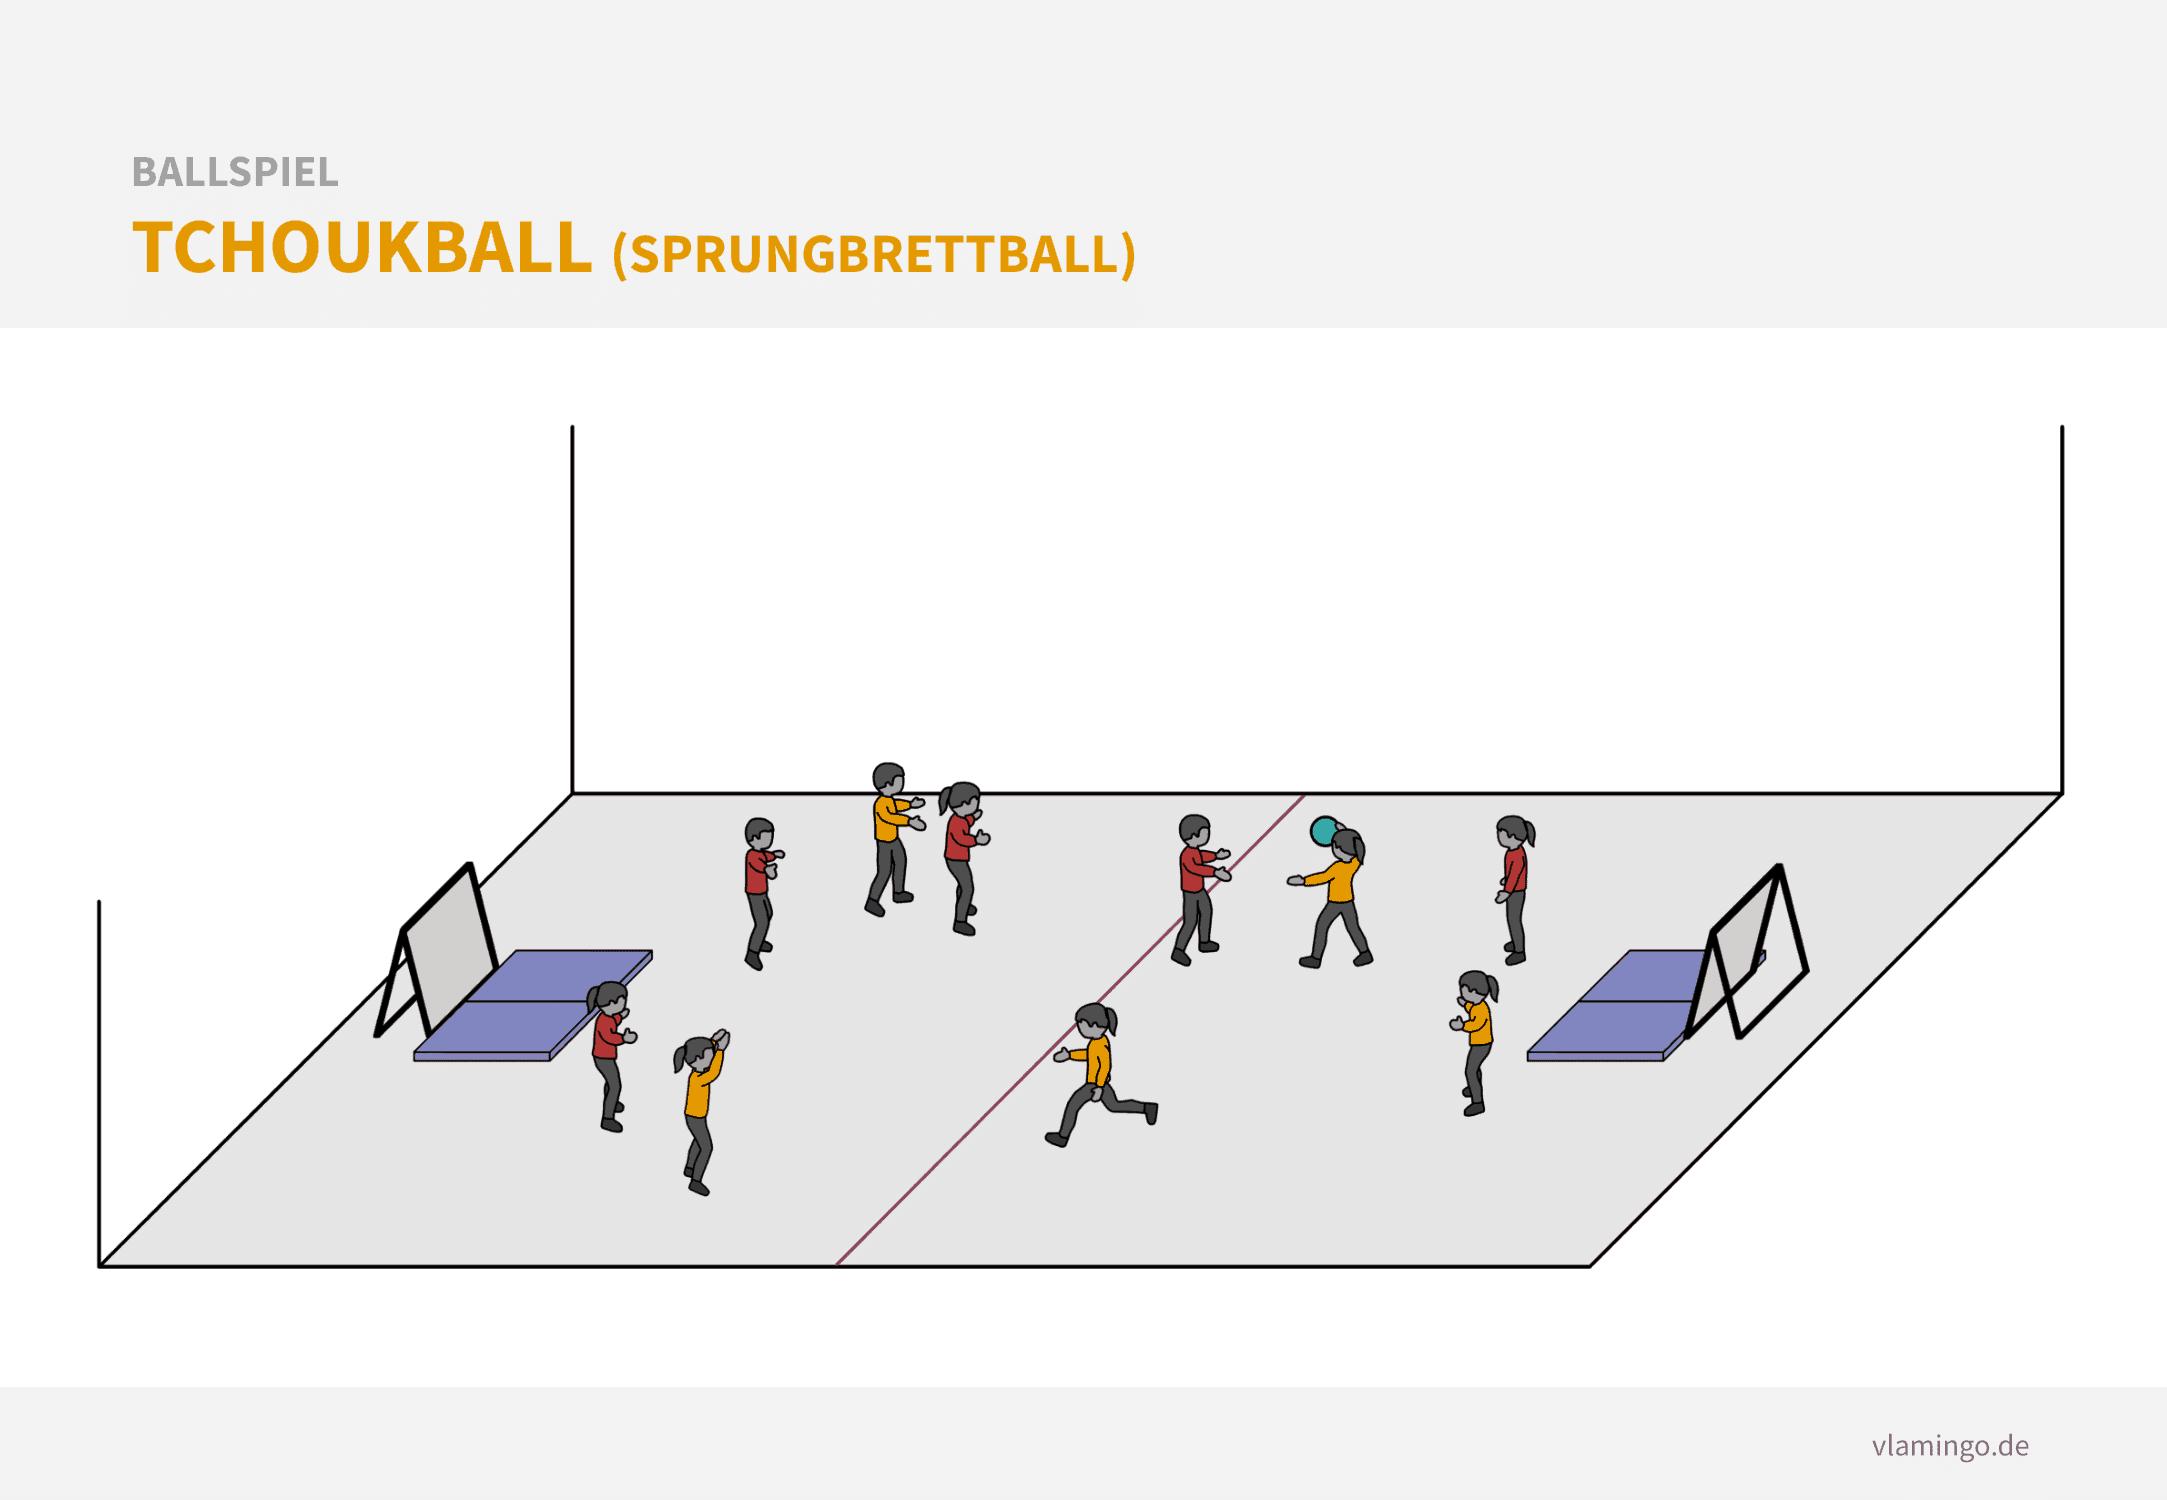 Ballspiel: Tchoukball - Sprungbrettball